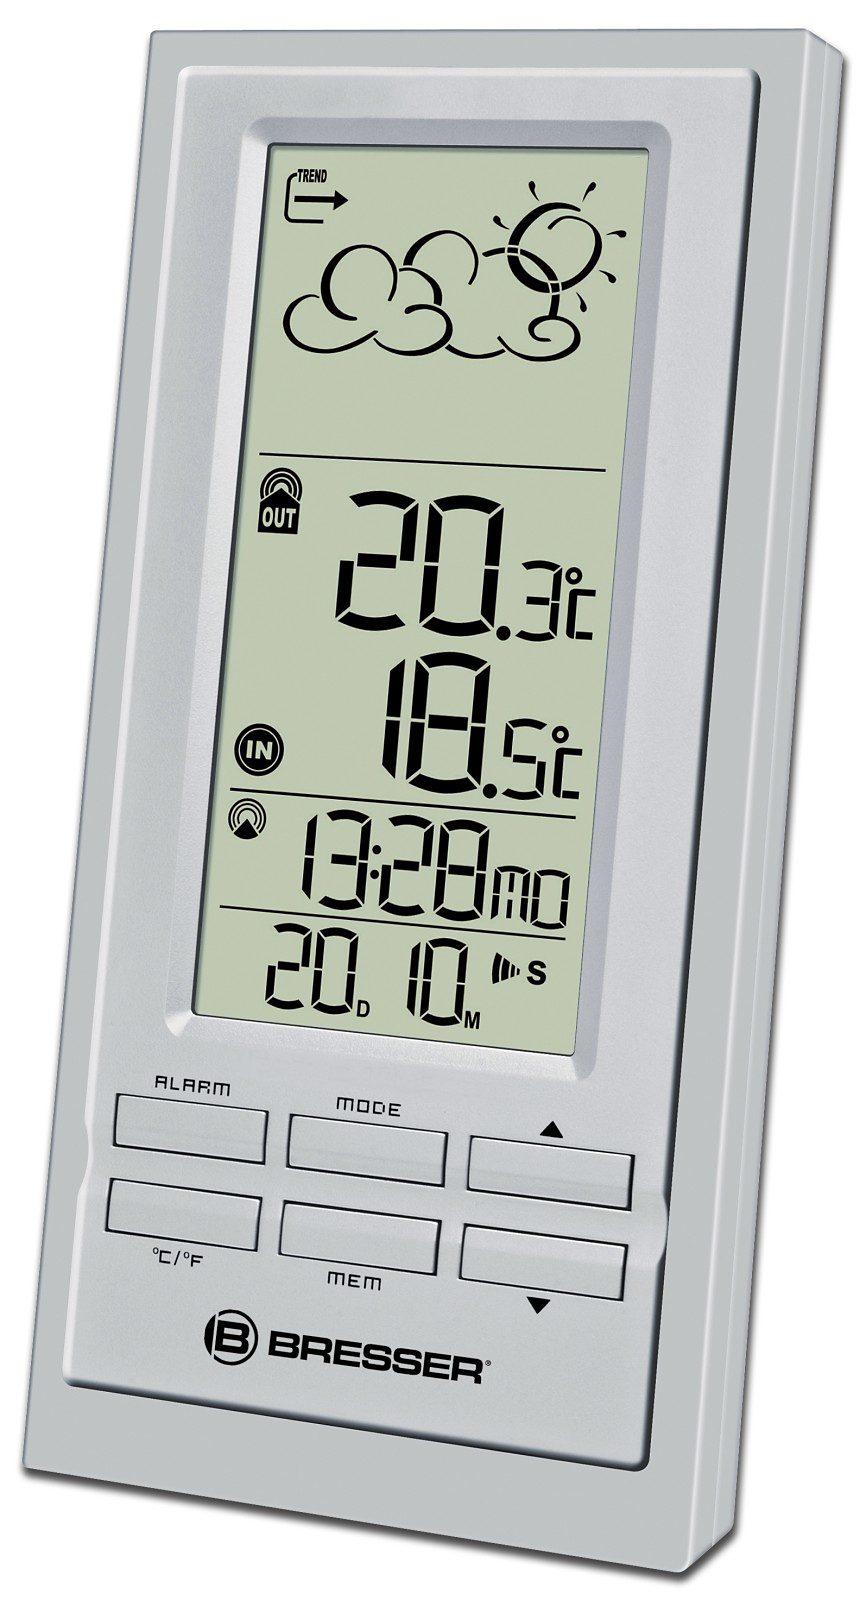 BRESSER Wetterstation »BRESSER NBF-6 Trend Funkwetterstation, silber«